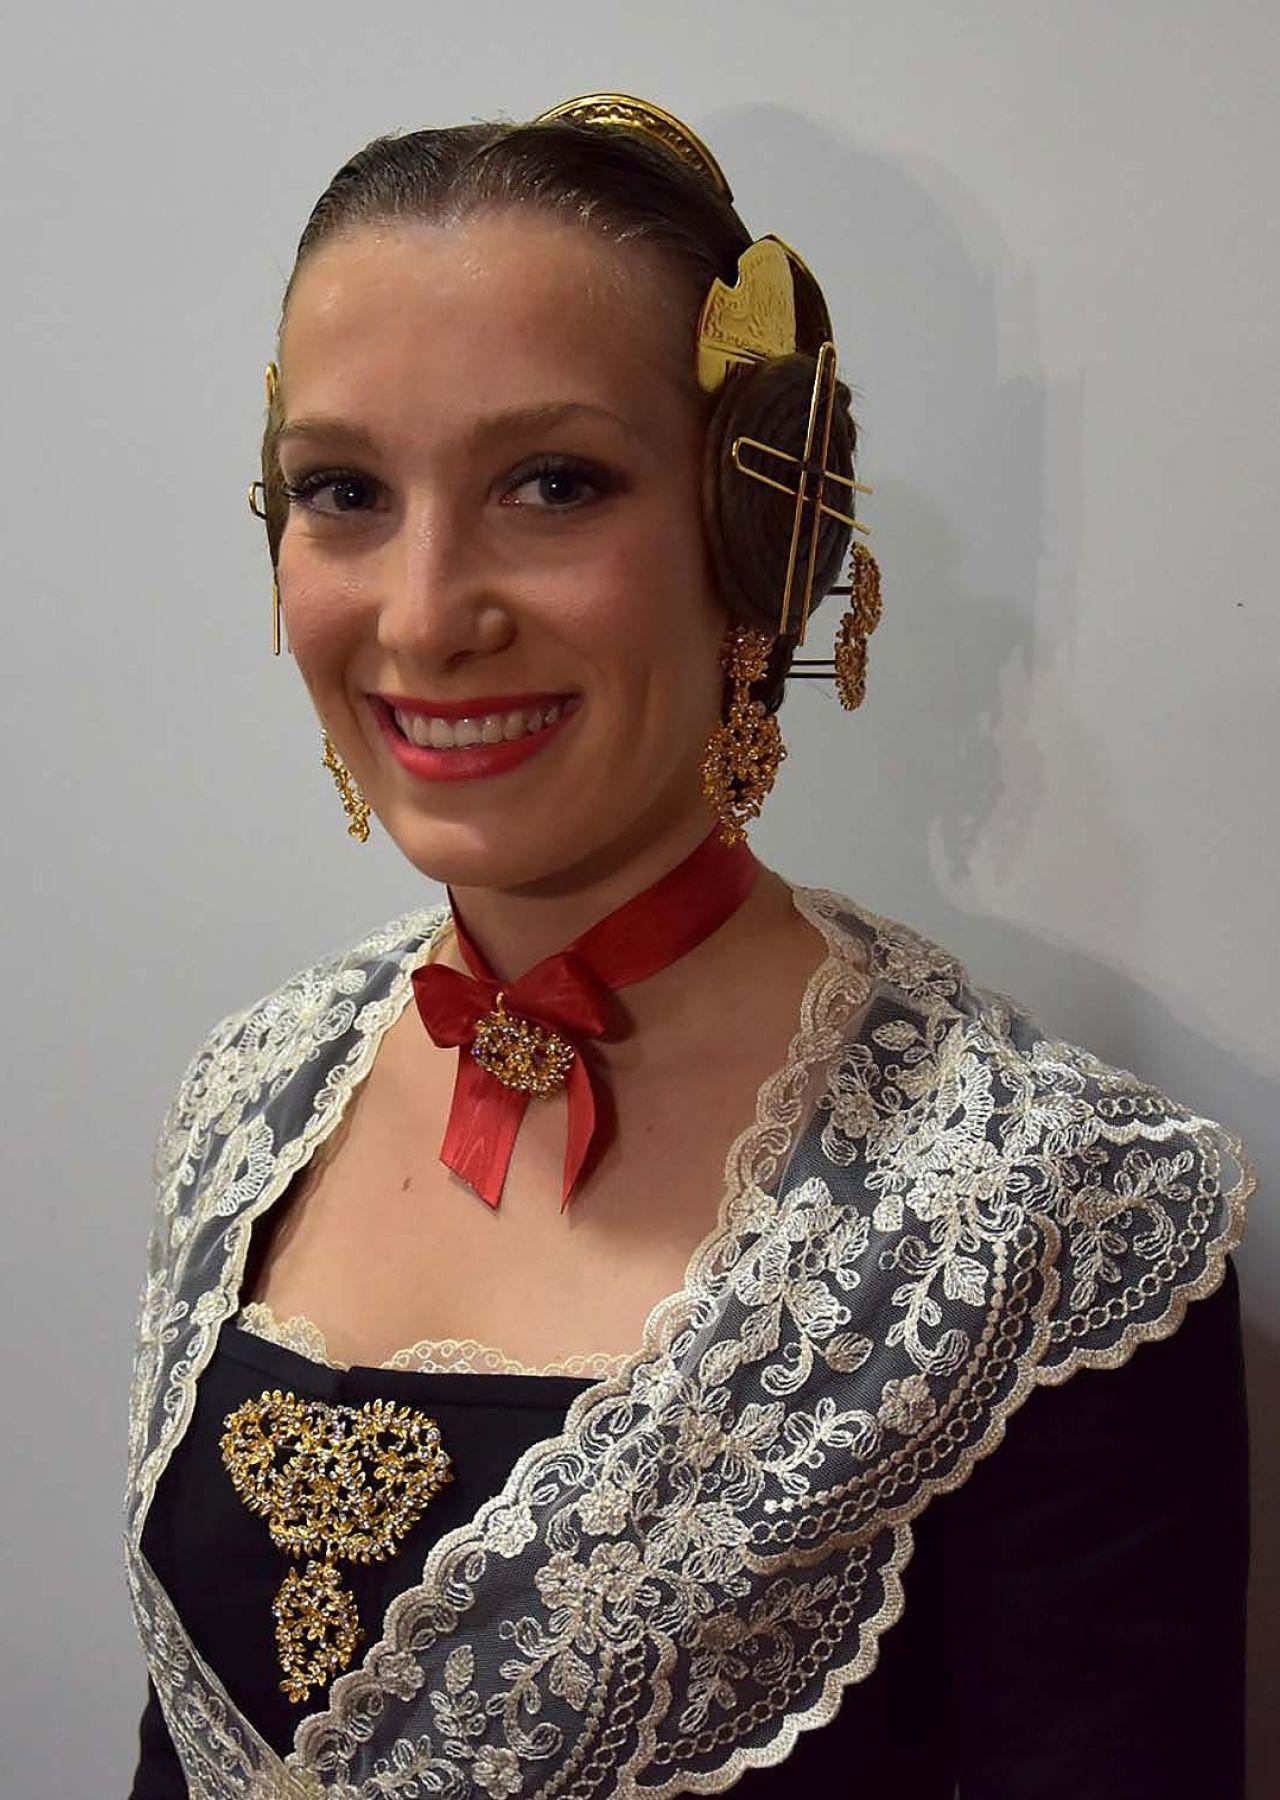 Cristina Oliva Nieves